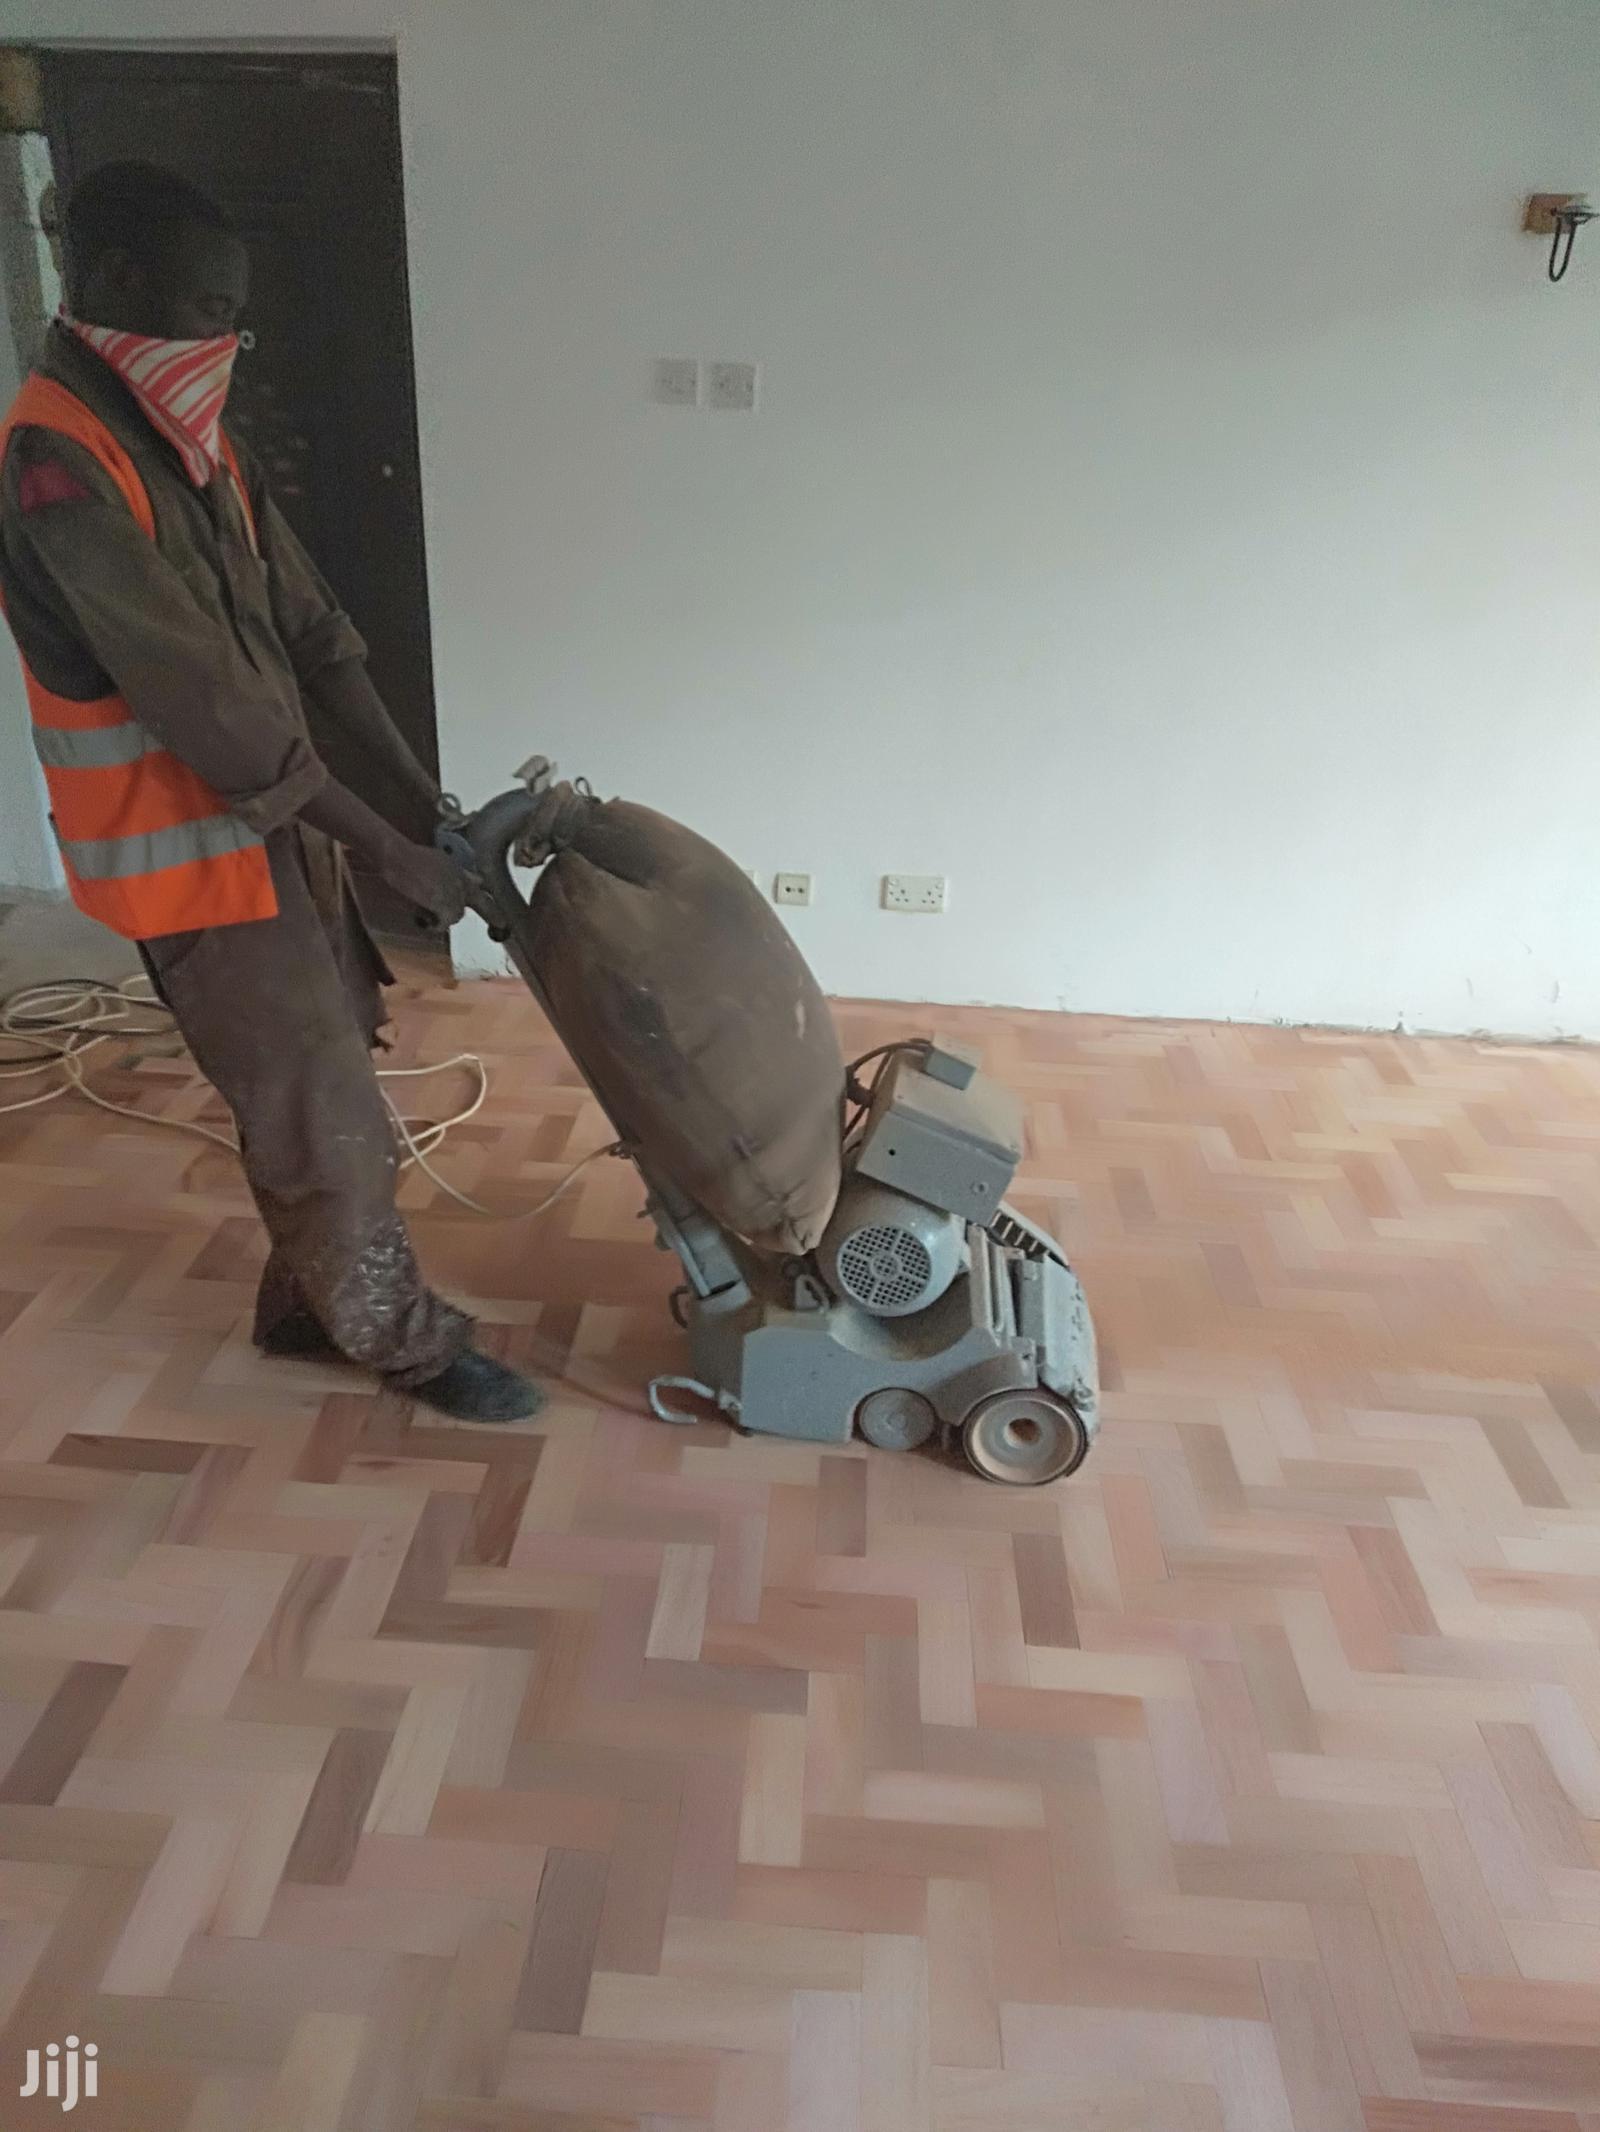 Flooring Work | Building & Trades Services for sale in Viwandani (Makadara), Nairobi, Kenya